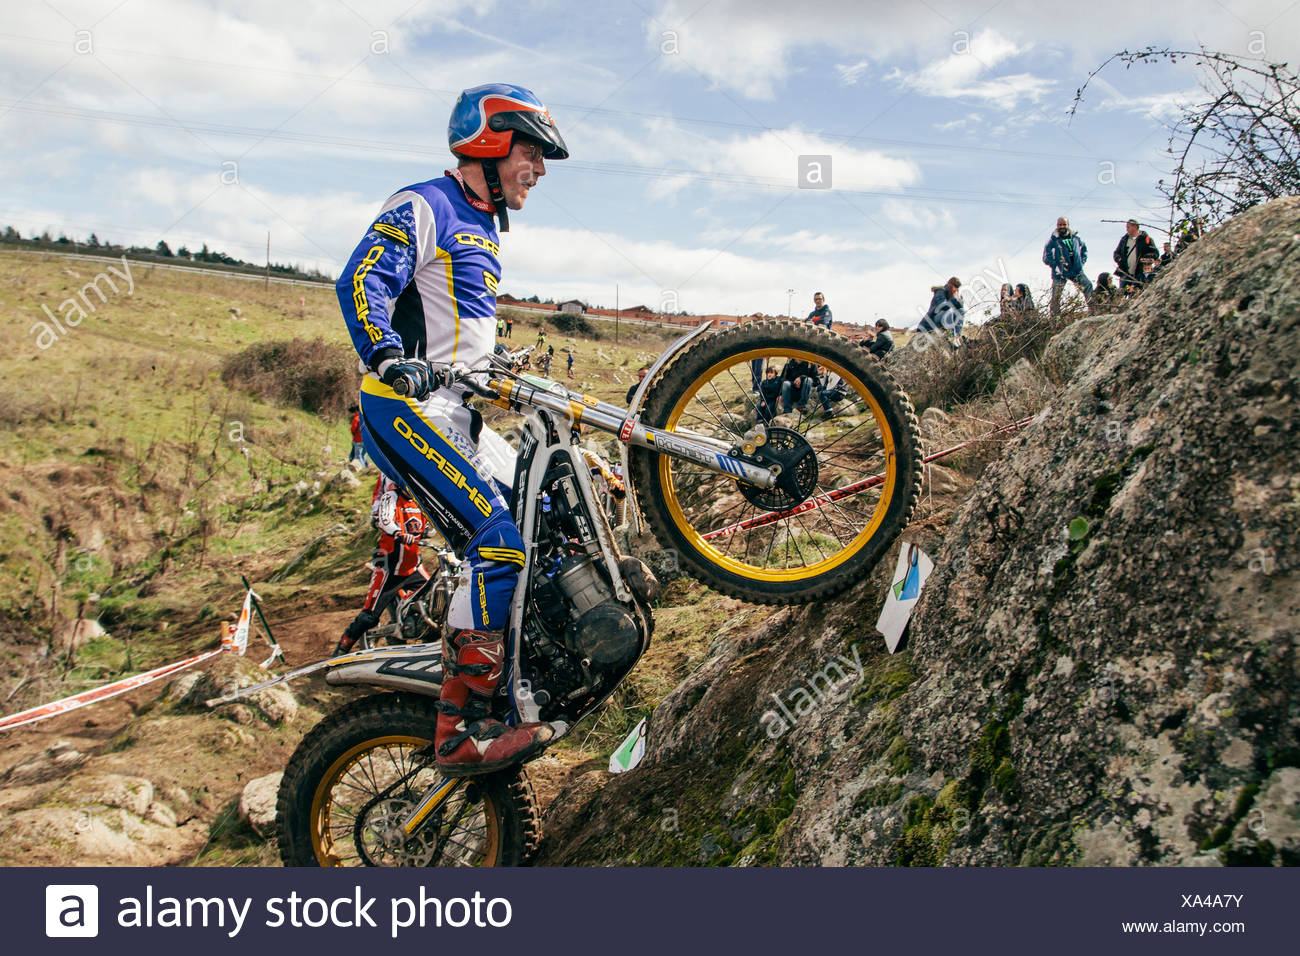 Spain, Madrid, El Molar, Motorcycle trials competition - Stock Image